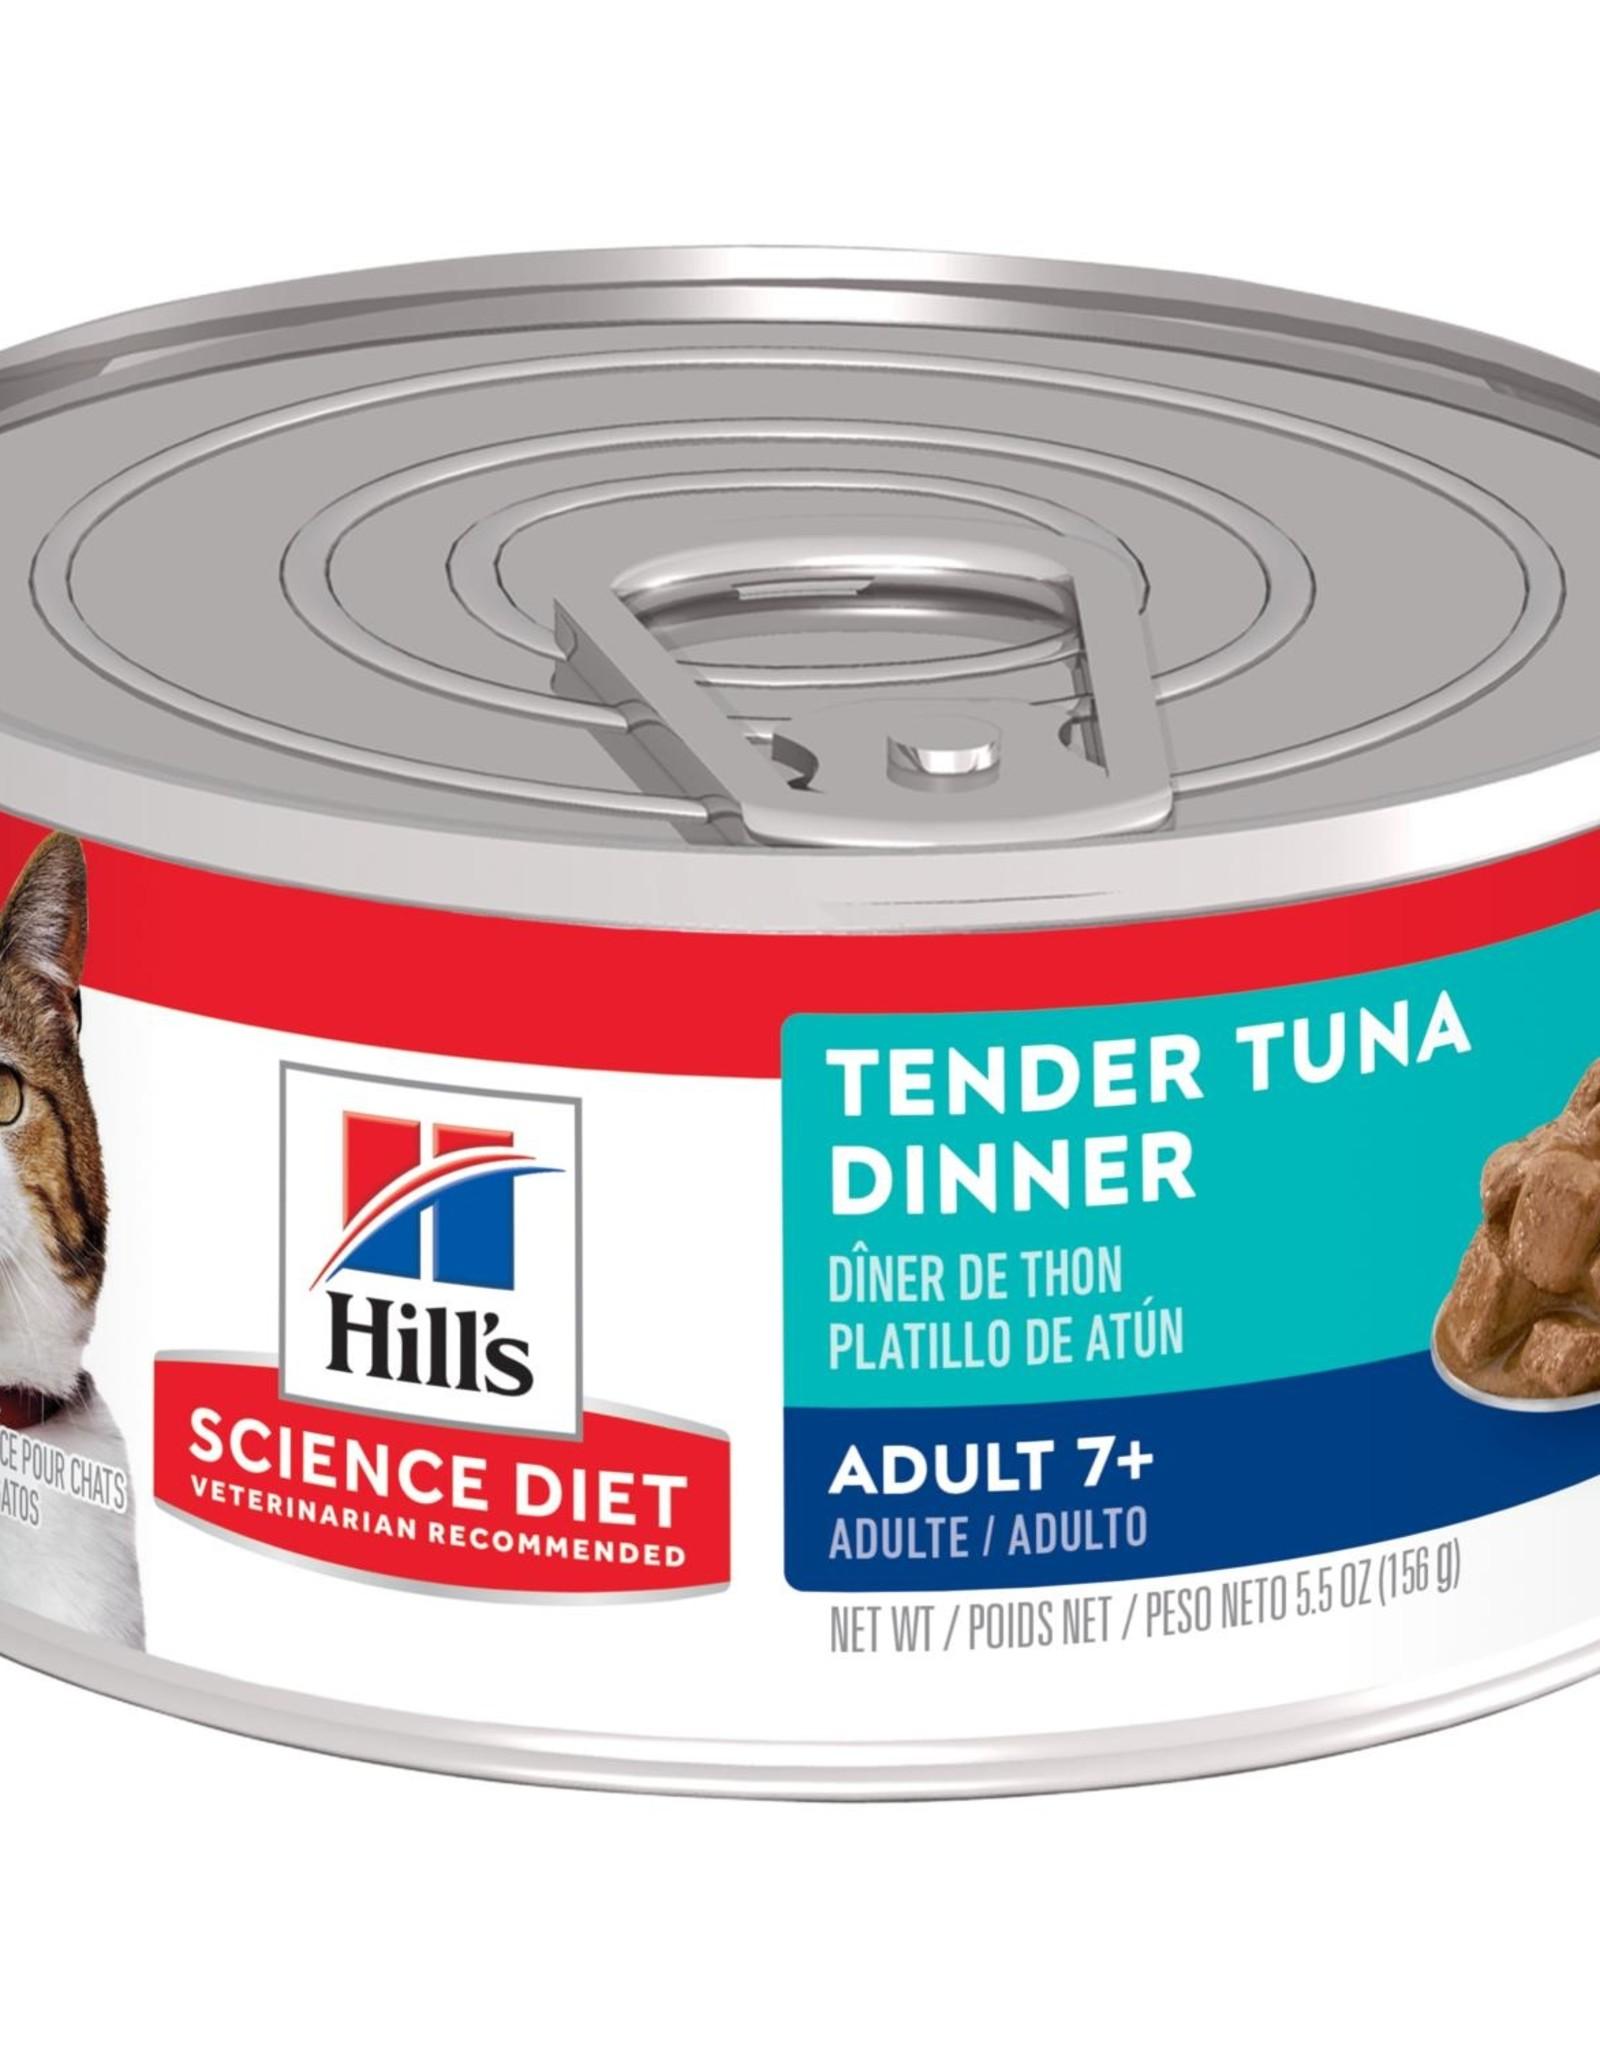 SCIENCE DIET HILL'S SCIENCE DIET FELINE CAN MATURE TENDER TUNA DINNER 5.5OZ CASE OF 24